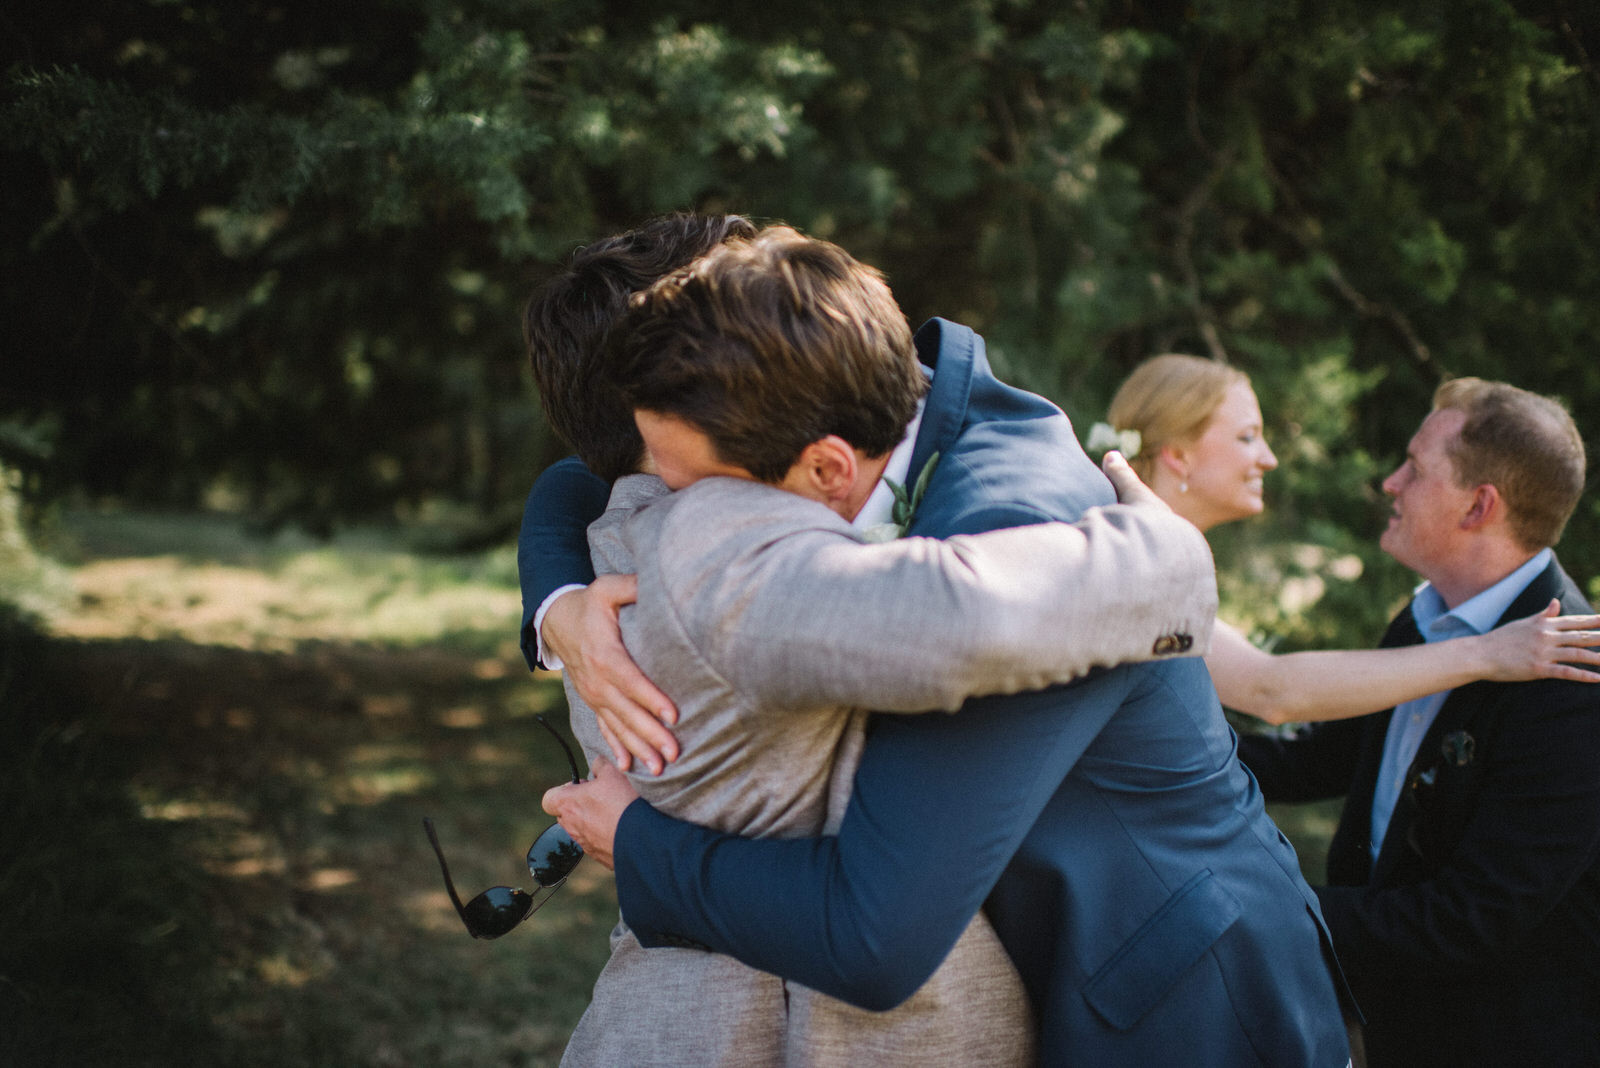 015-LOURMARIN-WEDDING-PHOTOGRAPHER-PROVENCE-WEDDING-ALTERNATIVE-WEDDING-PHOTOGRAPHY-FRANCE-PROVENCE-GARDEN-WEDDING.JPG